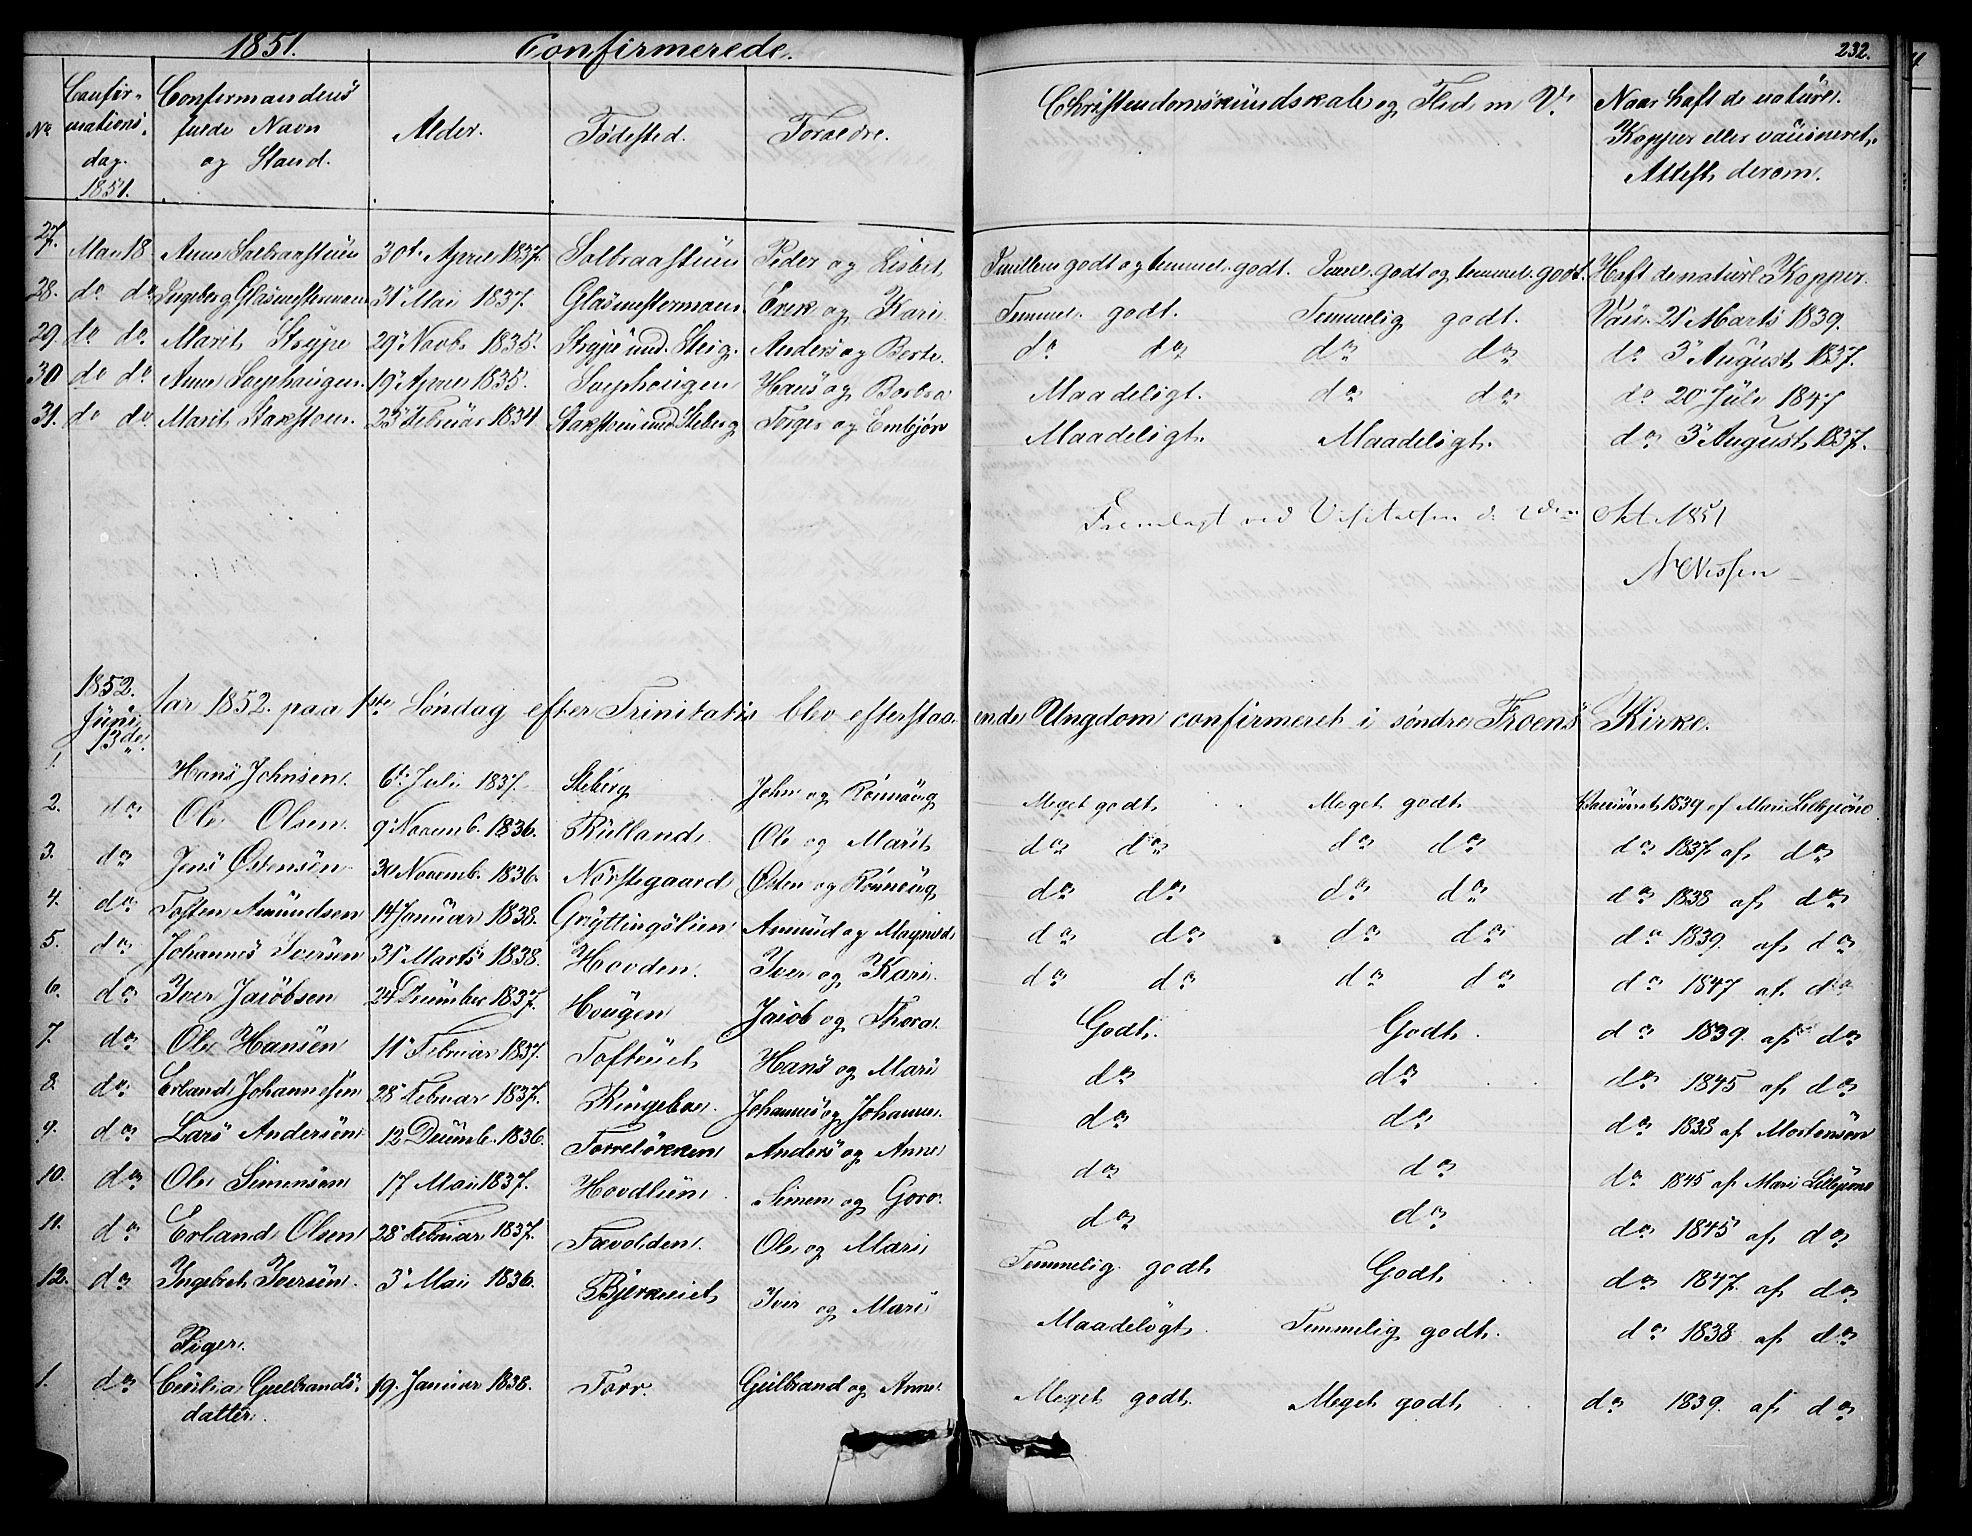 SAH, Sør-Fron prestekontor, H/Ha/Hab/L0001: Klokkerbok nr. 1, 1844-1863, s. 232